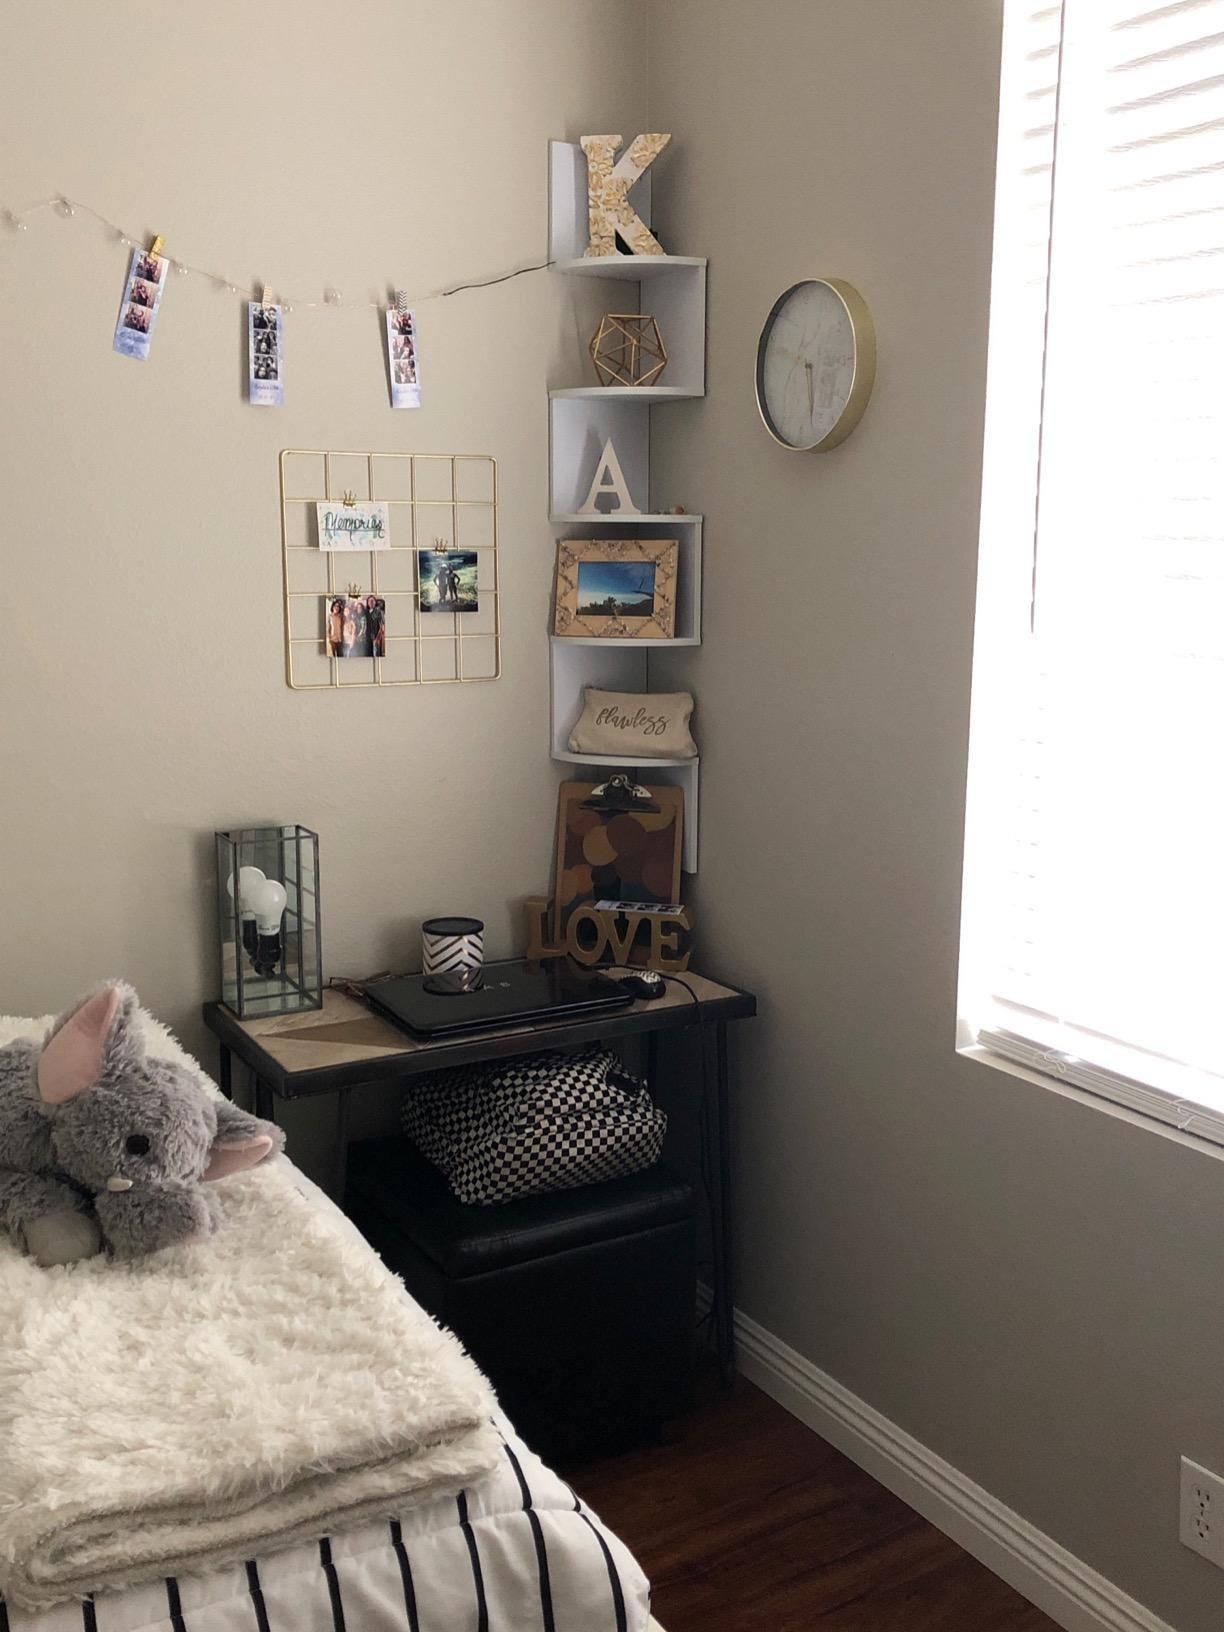 44+ Small Bedroom Ideas Buzzfeed, Great Concept